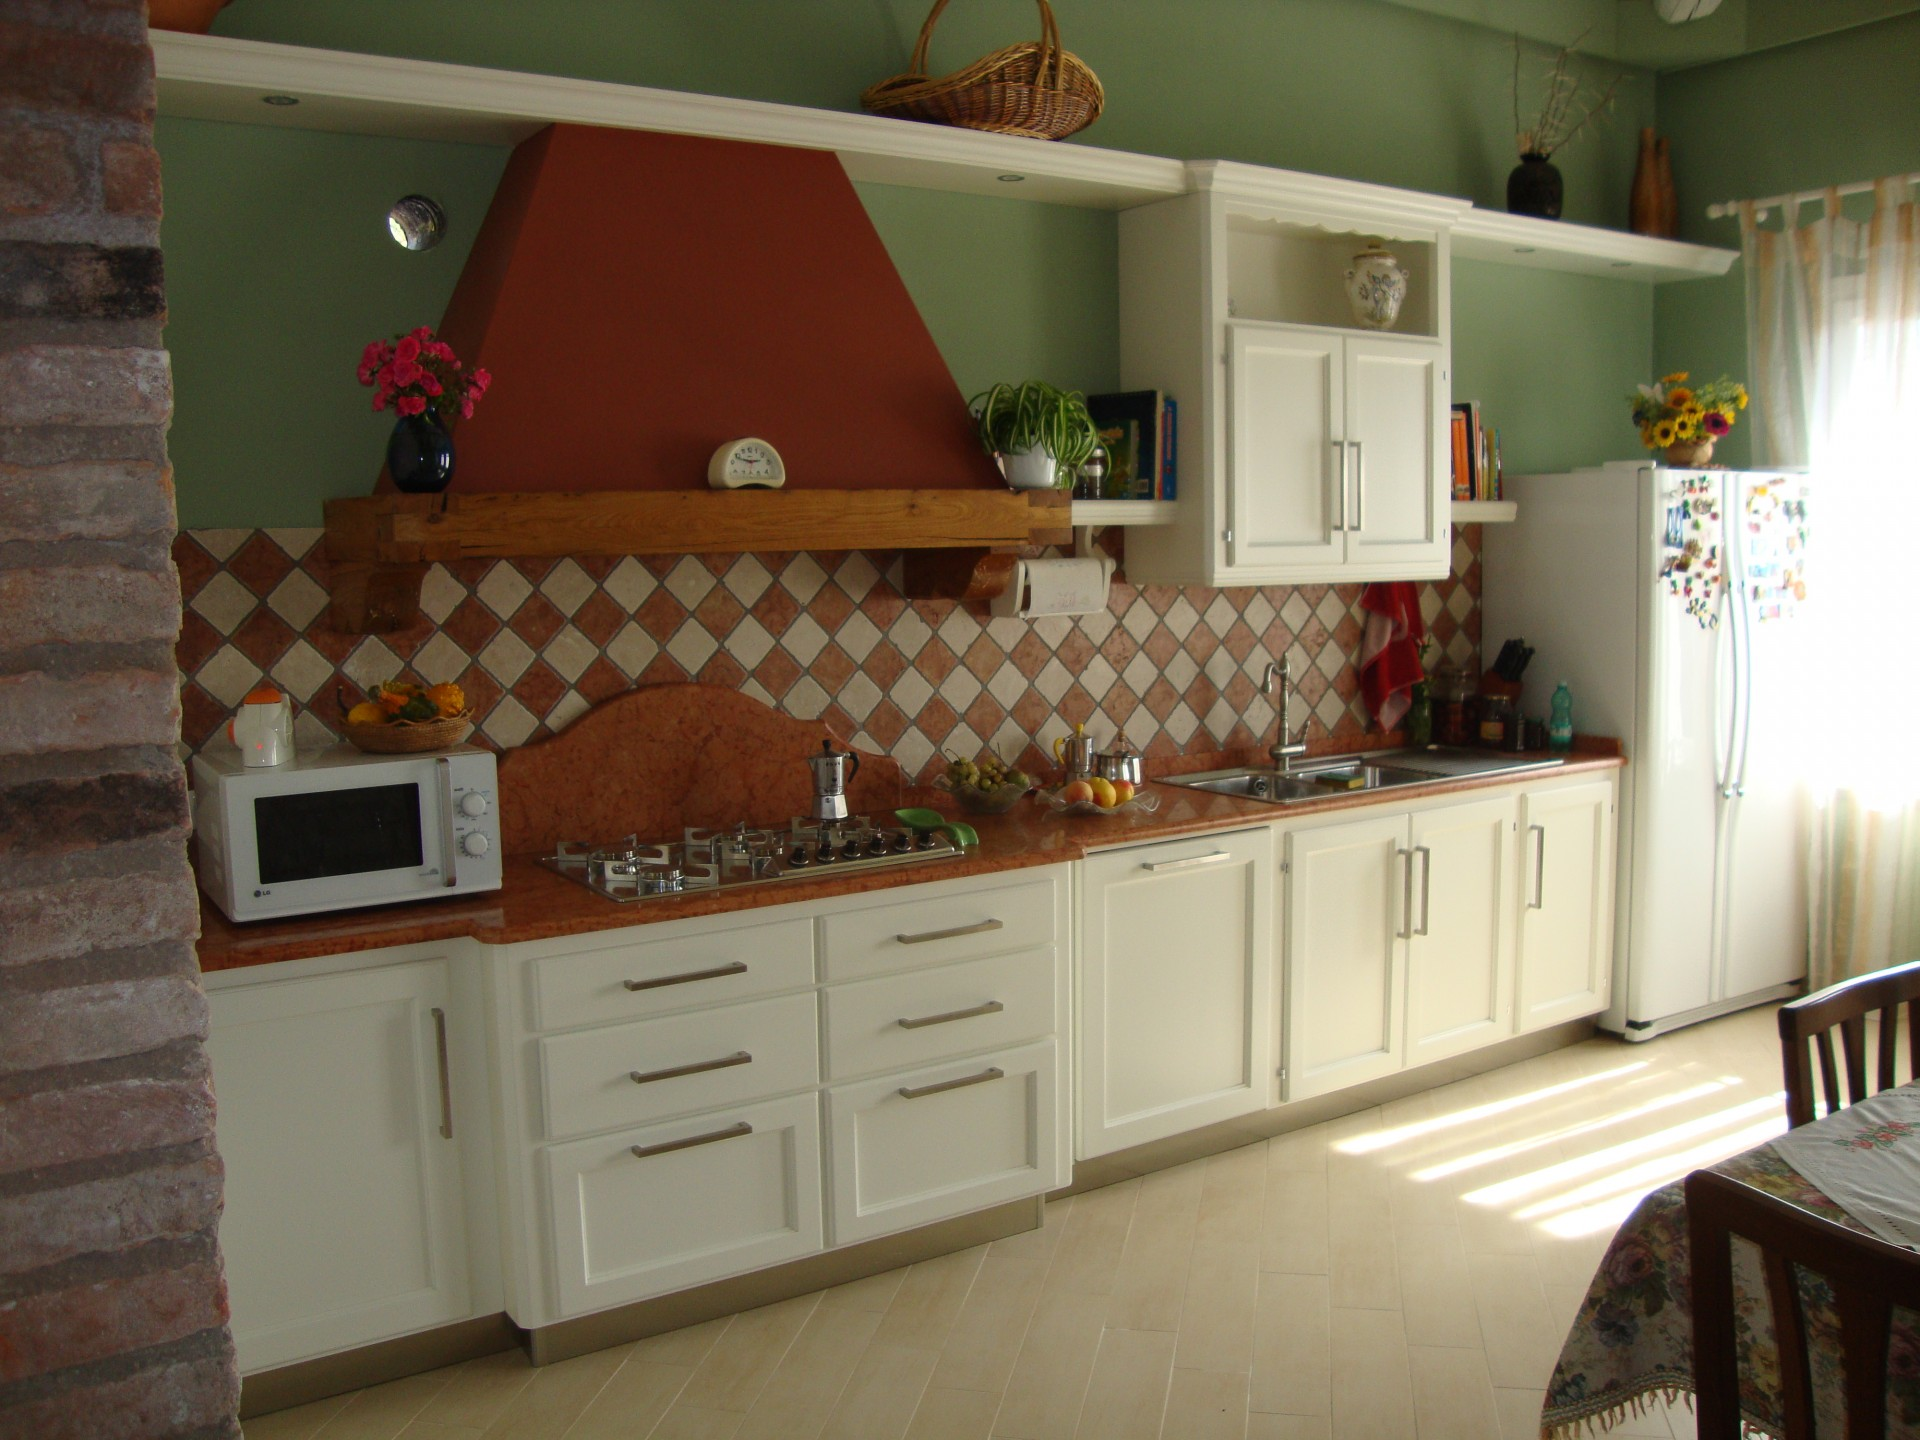 Cucine Moderne Fadini Mobili Cerea Verona #A86C23 1920 1440 Cucine Moderne Di Legno